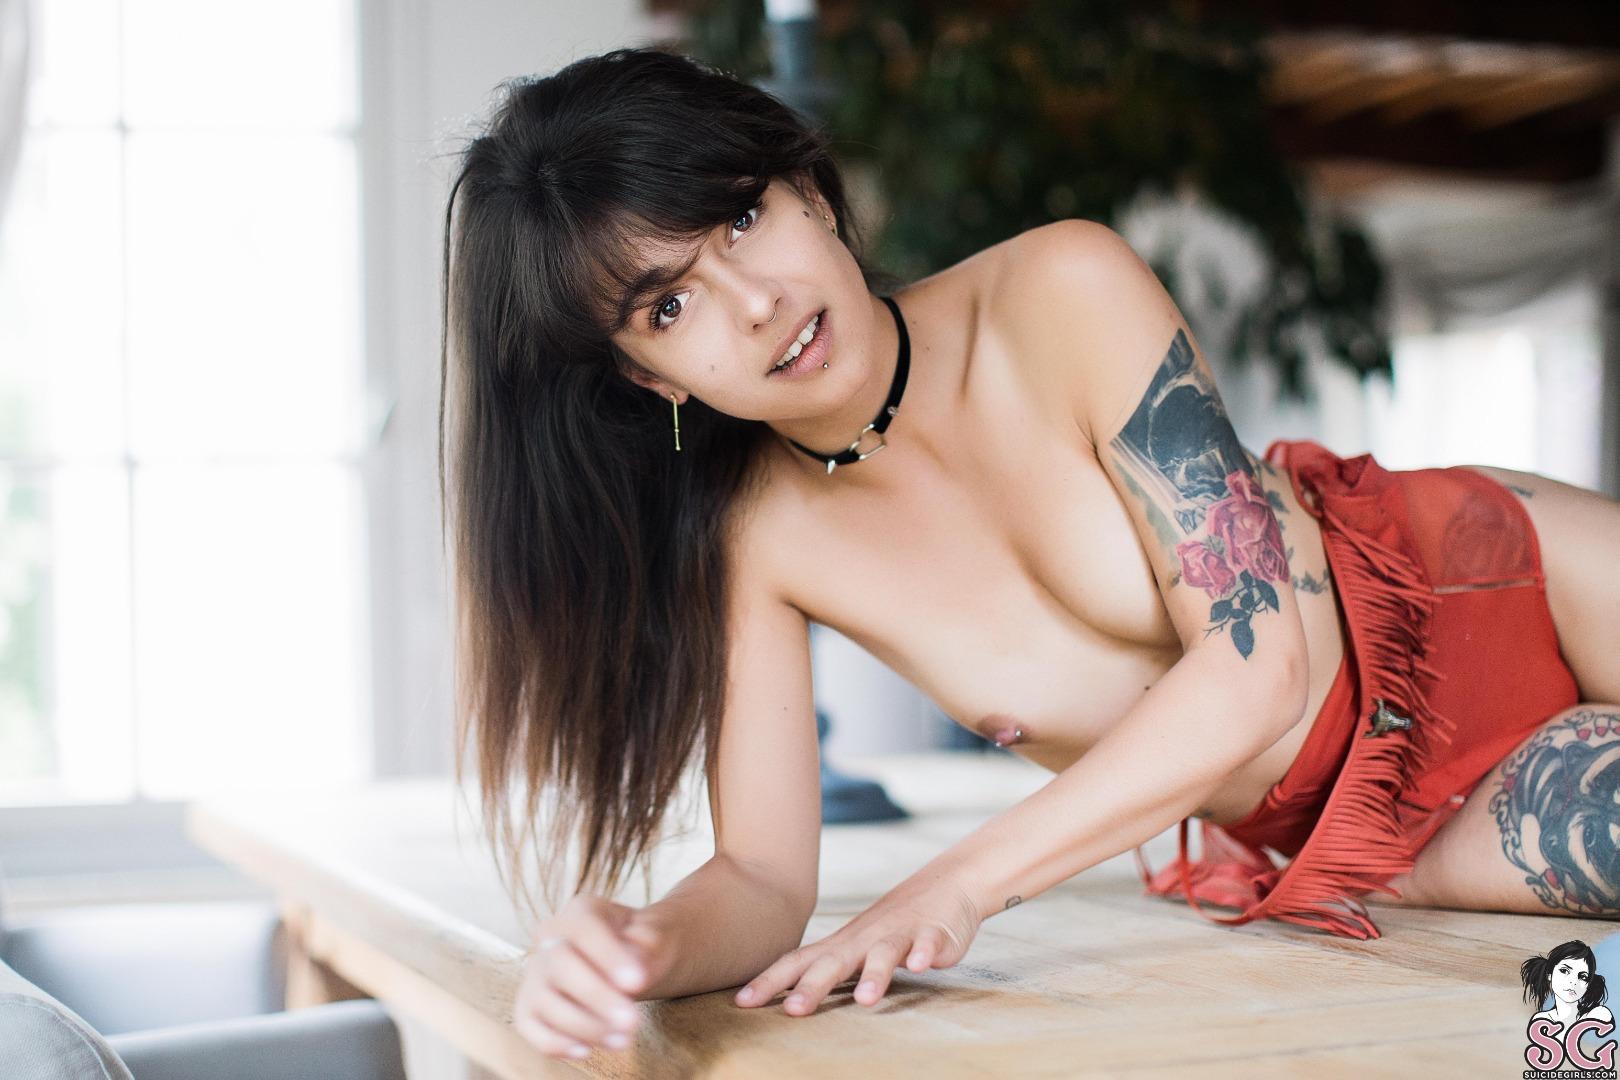 beach voyeur sex voyeur sex spycam tube hidden cam